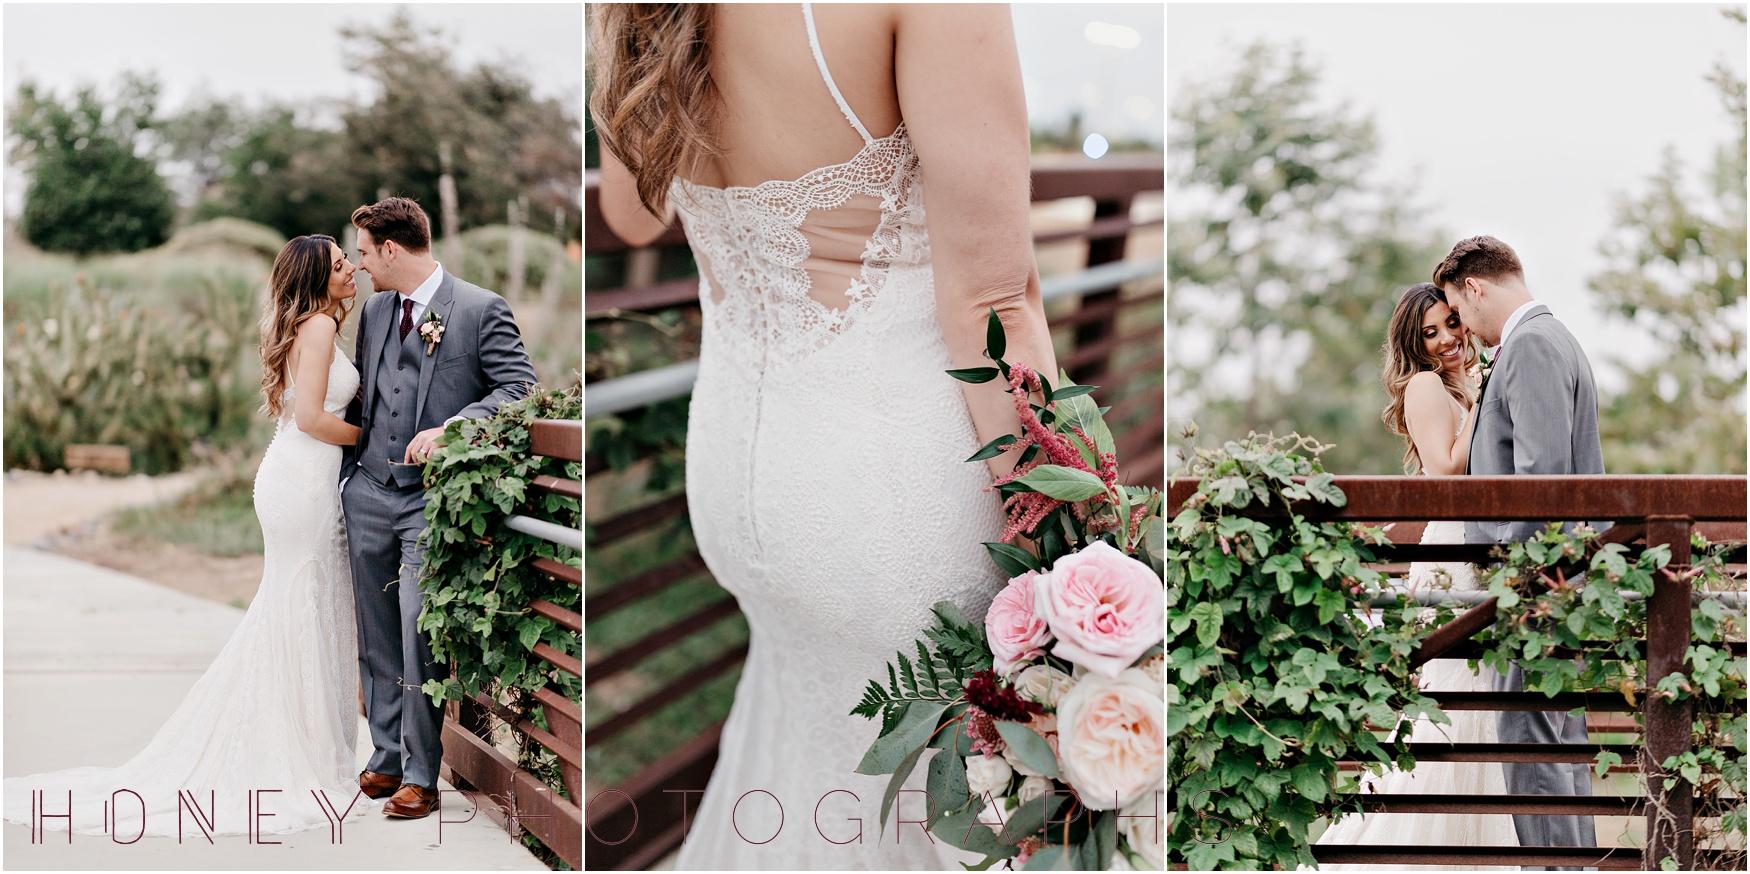 garden-classic-burgundy-jewel-tone-luxury-pacific-event-oceanside-wedding52.jpg